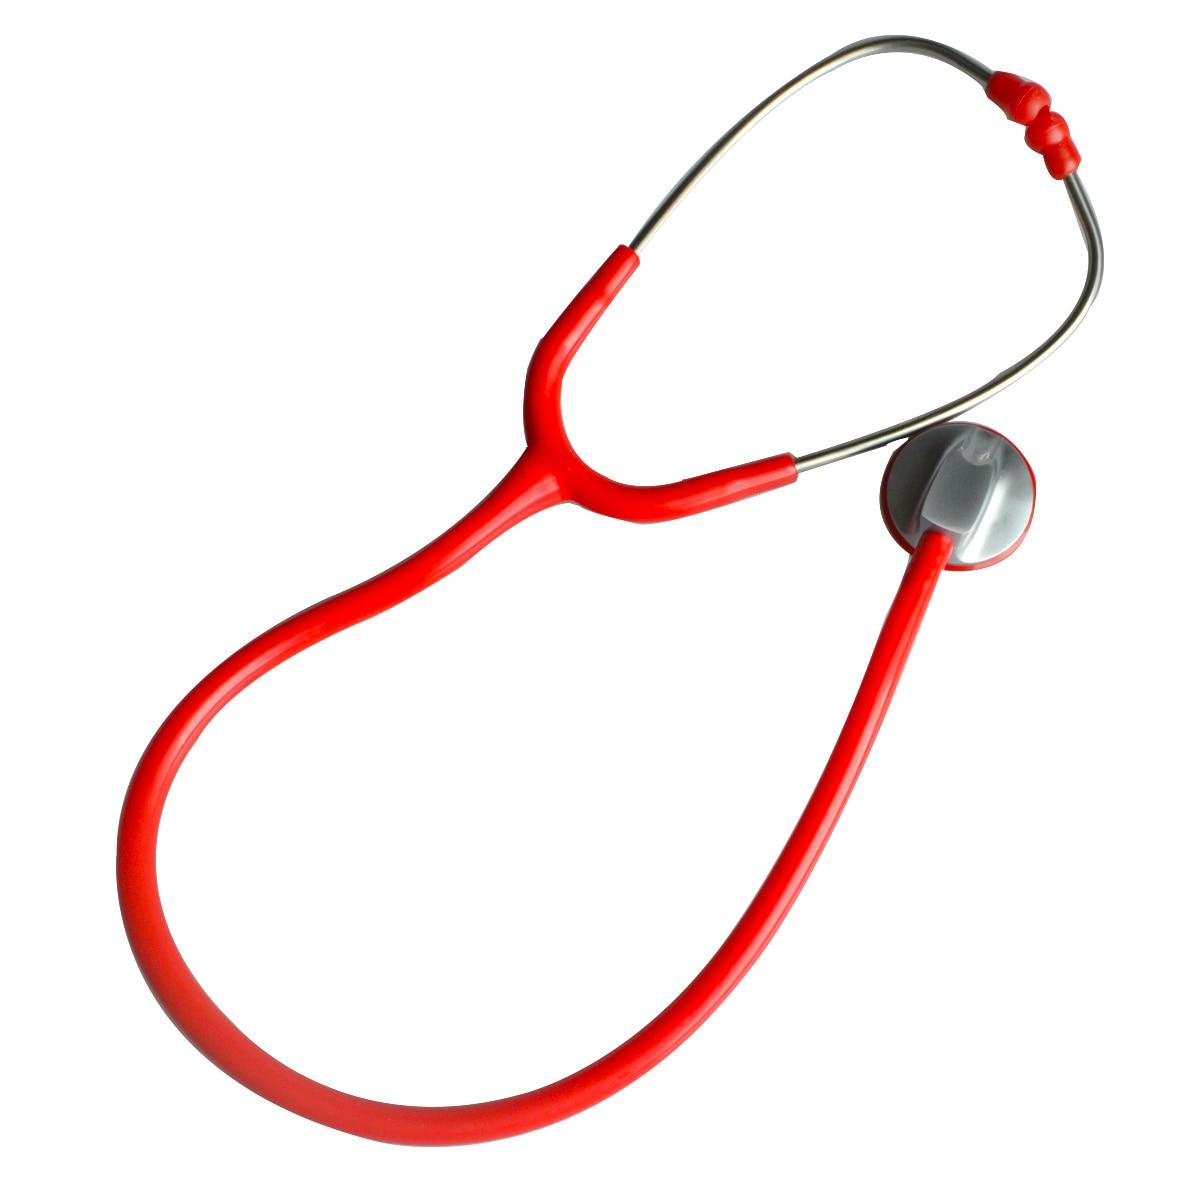 5Pcs/Lot ELYSAID Single Head Stethoscope Healthcare Functional Professional Medical Equipment Blood Pressure For Doctors/Nurses